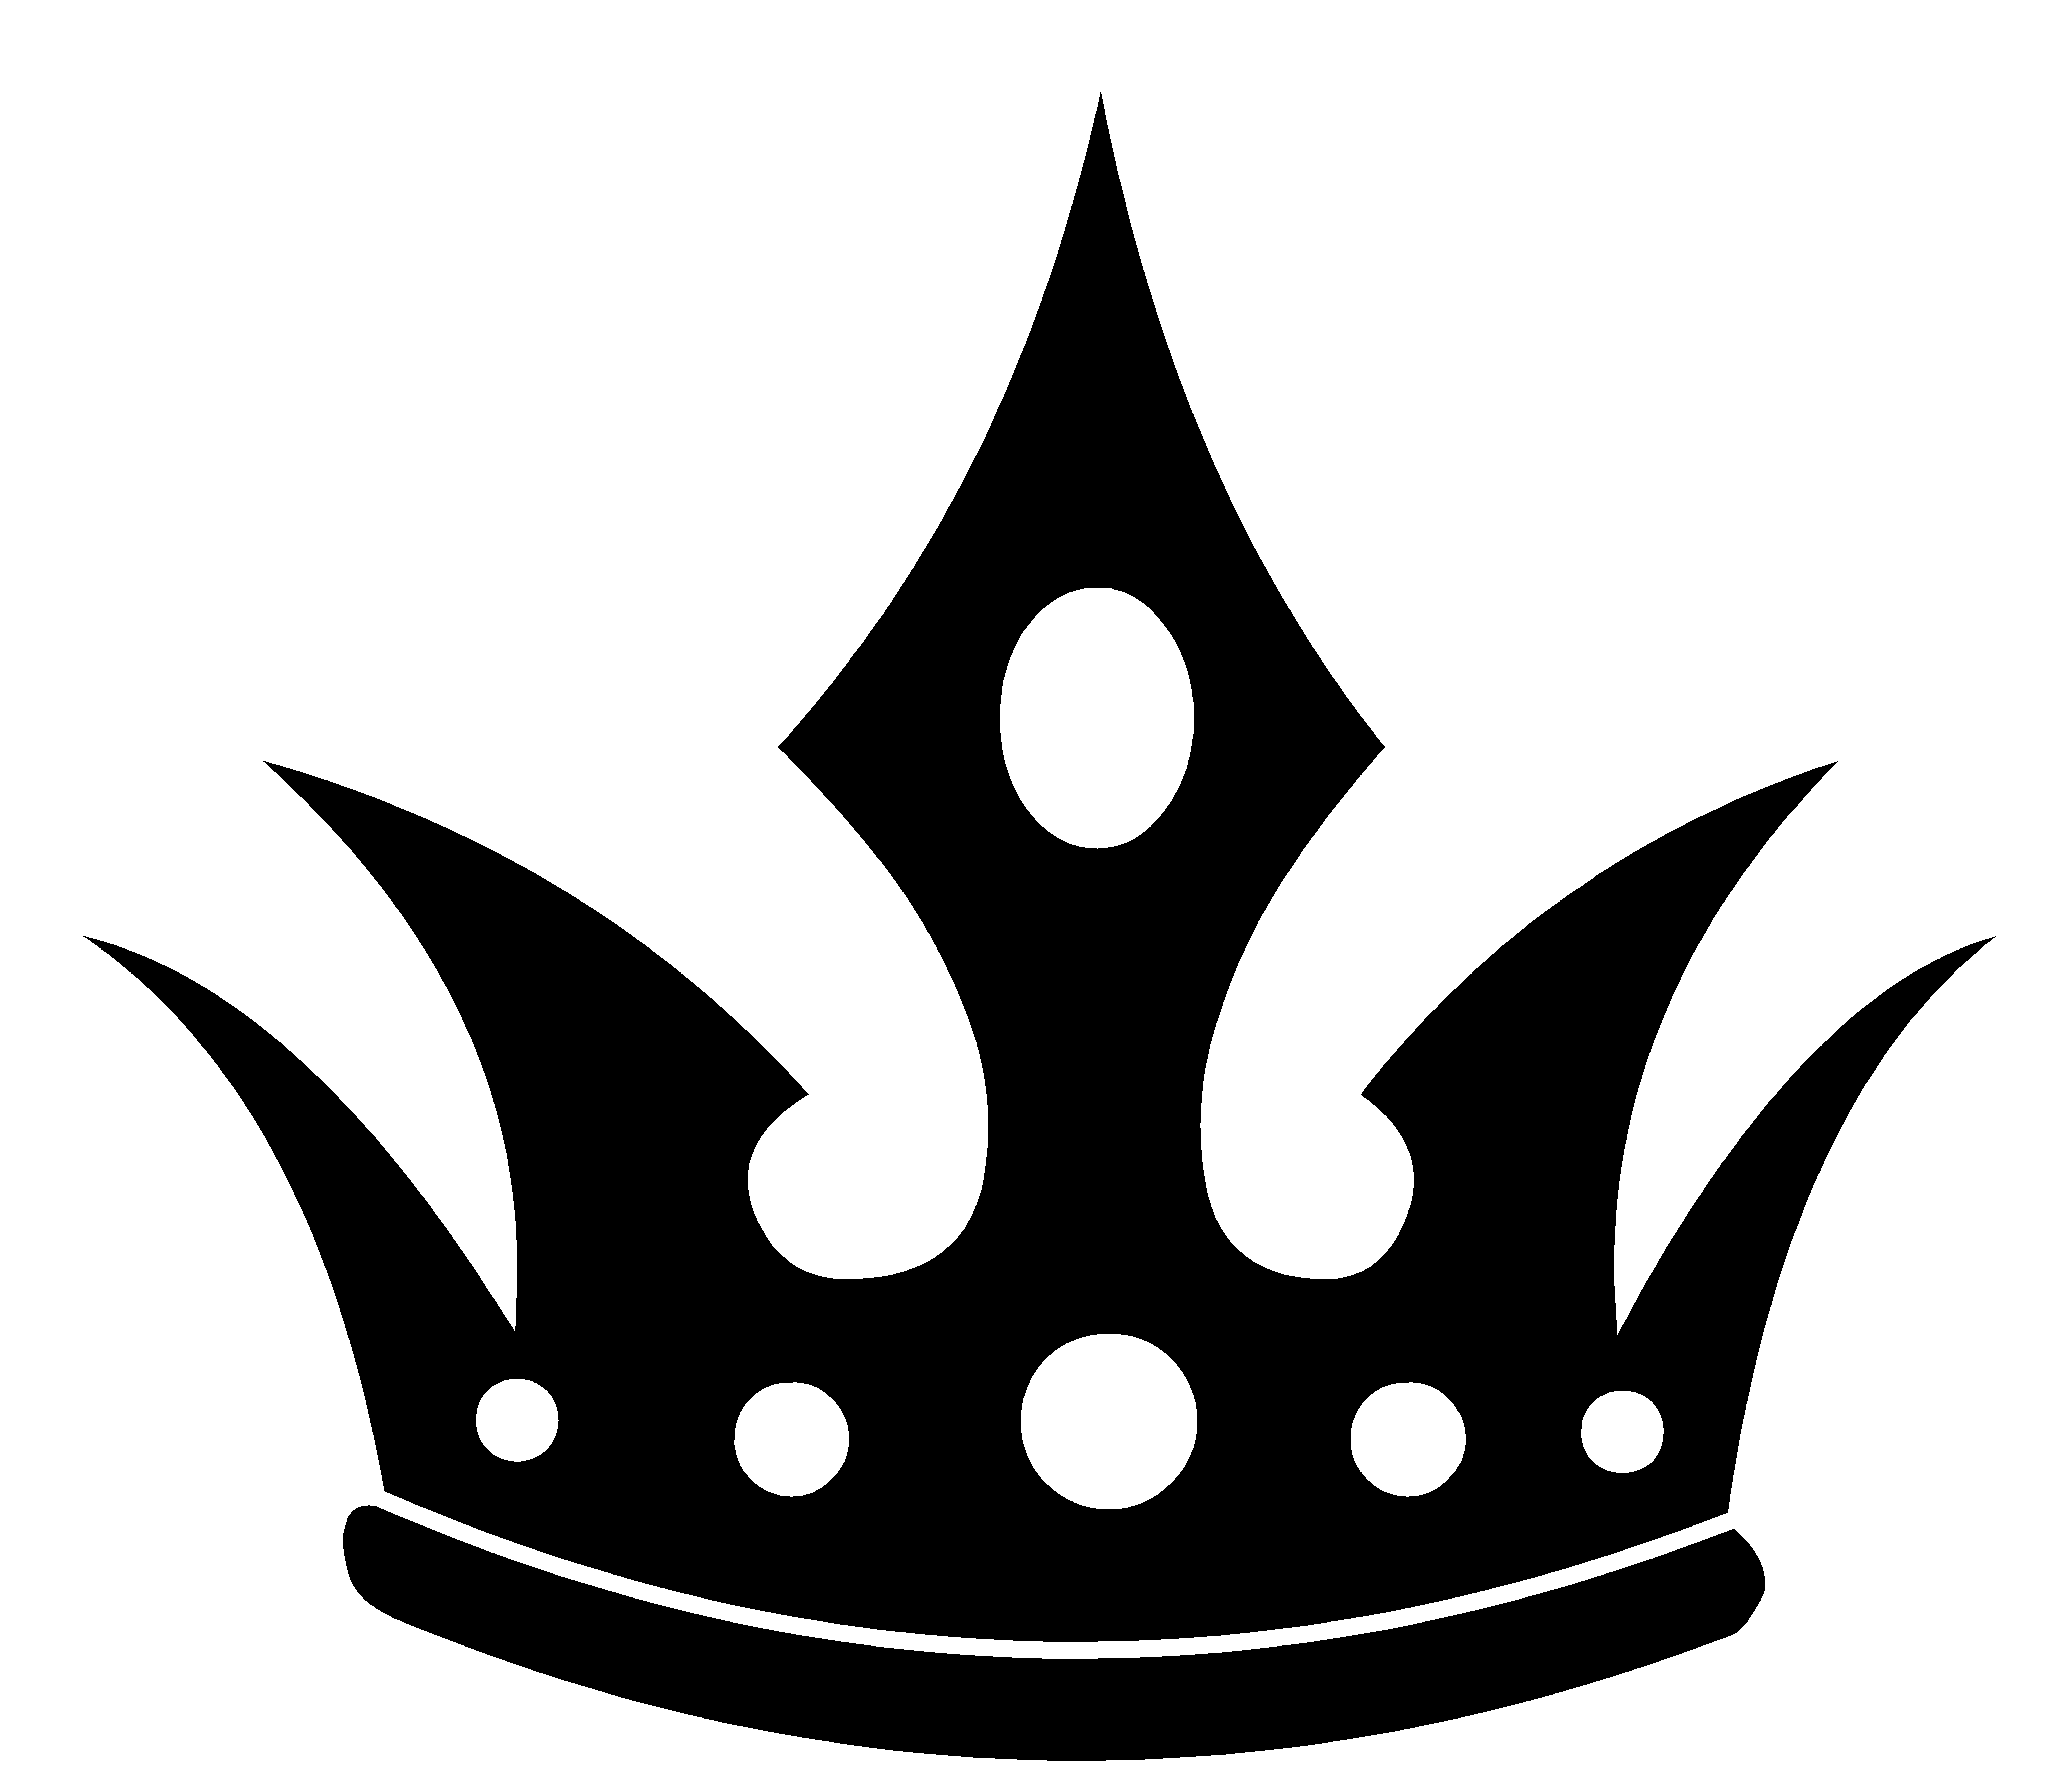 monarchy clipart-monarchy clipart-17